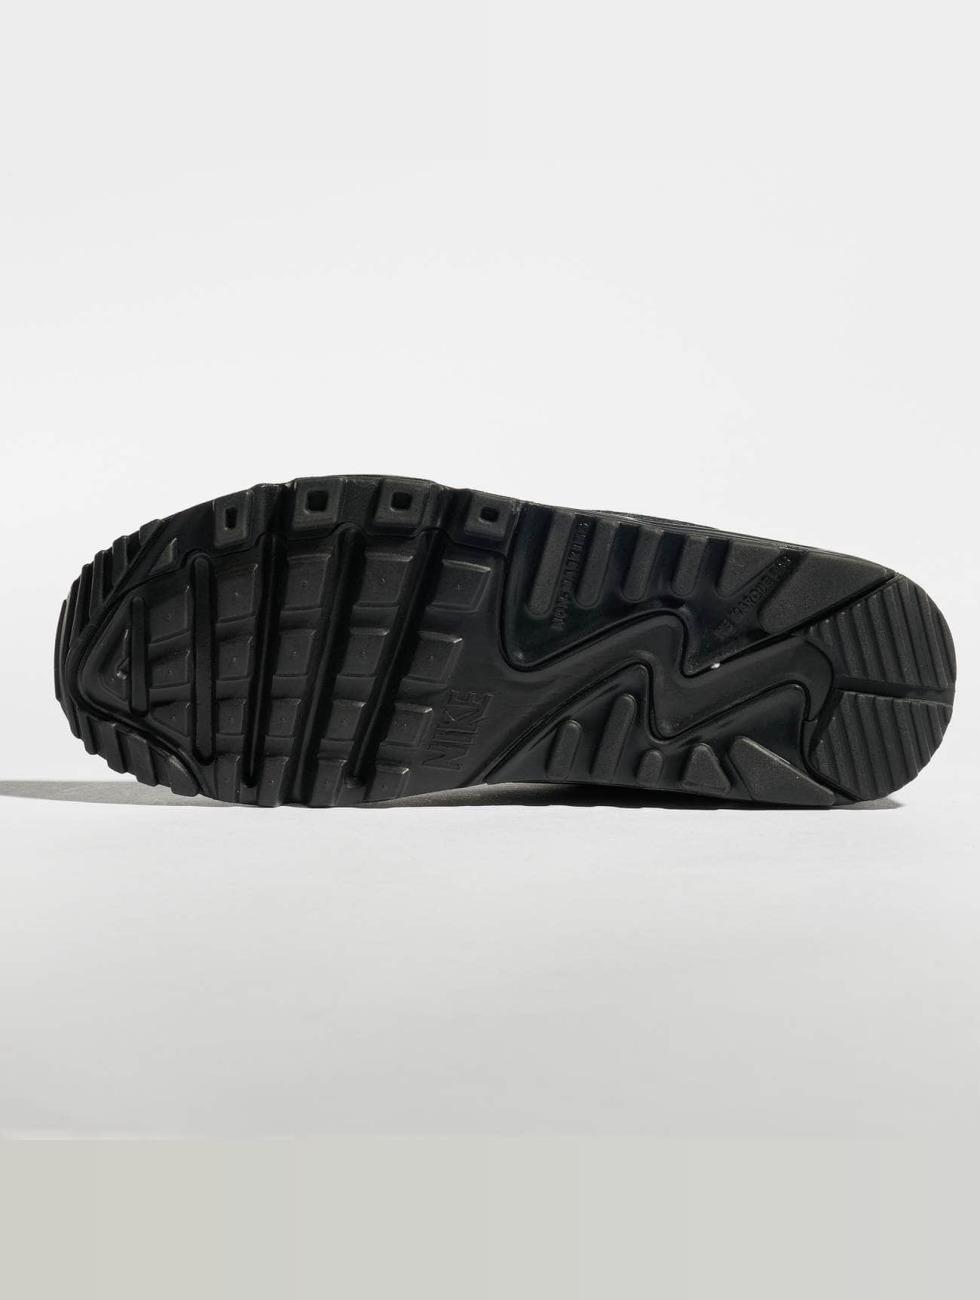 Beste Koop Goedkope Online Nike schoen / sneaker Air Max 90 Mesh (GS) in zwart 289322 Goedkope Koop Amazon 100% Authentiek Goedkoop Online Klaring 2018 Nieuwe Klaring Winkel Online Te Koop JYv4W2n